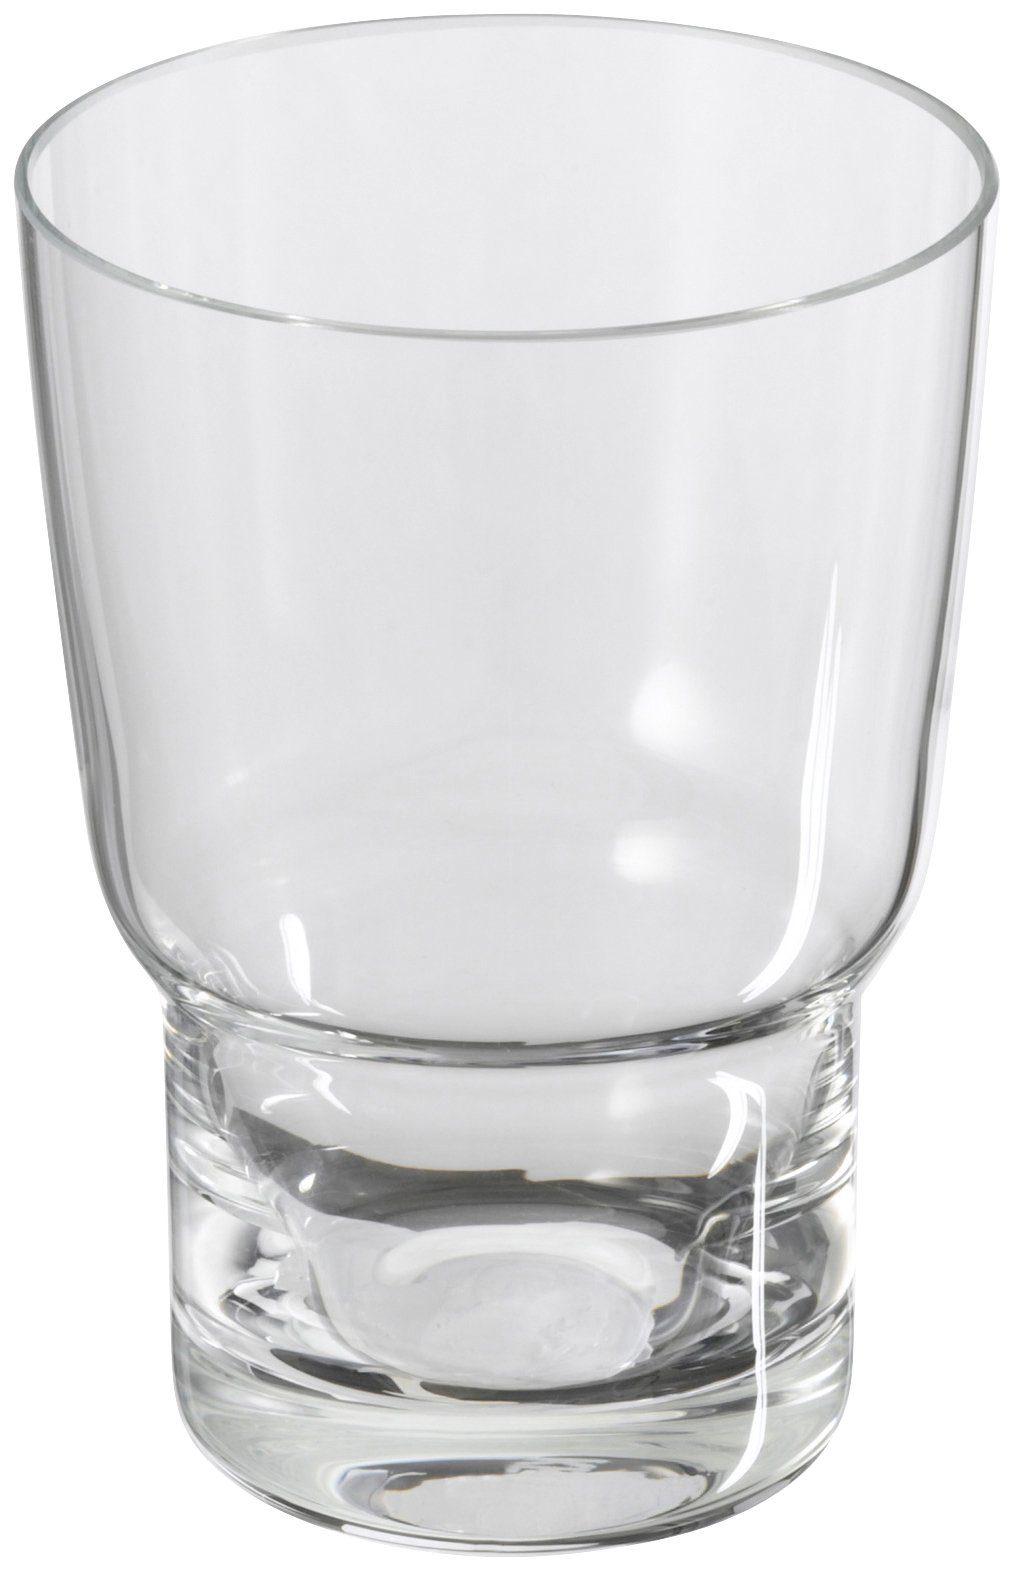 KEUCO Ersatzglas »City 2«, Echtkristall-Glas, lose